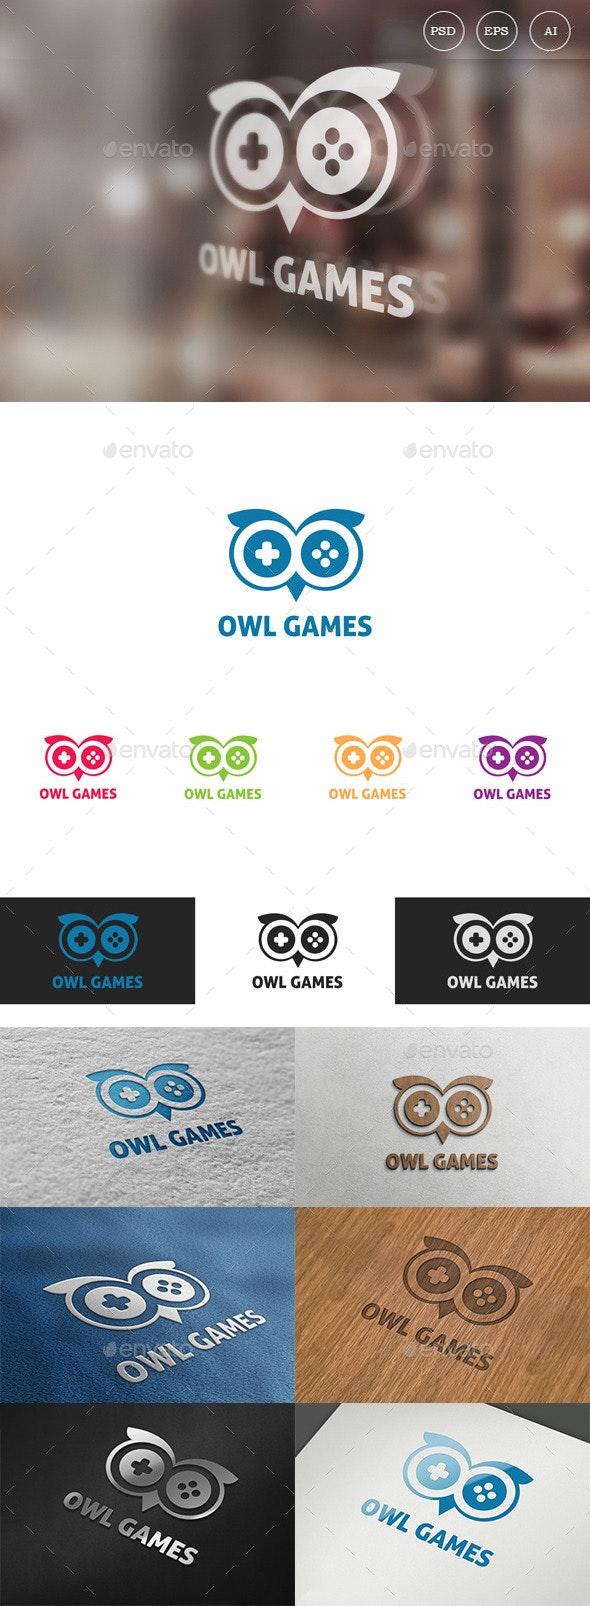 Owl Games Logo - Animals Logo Templates